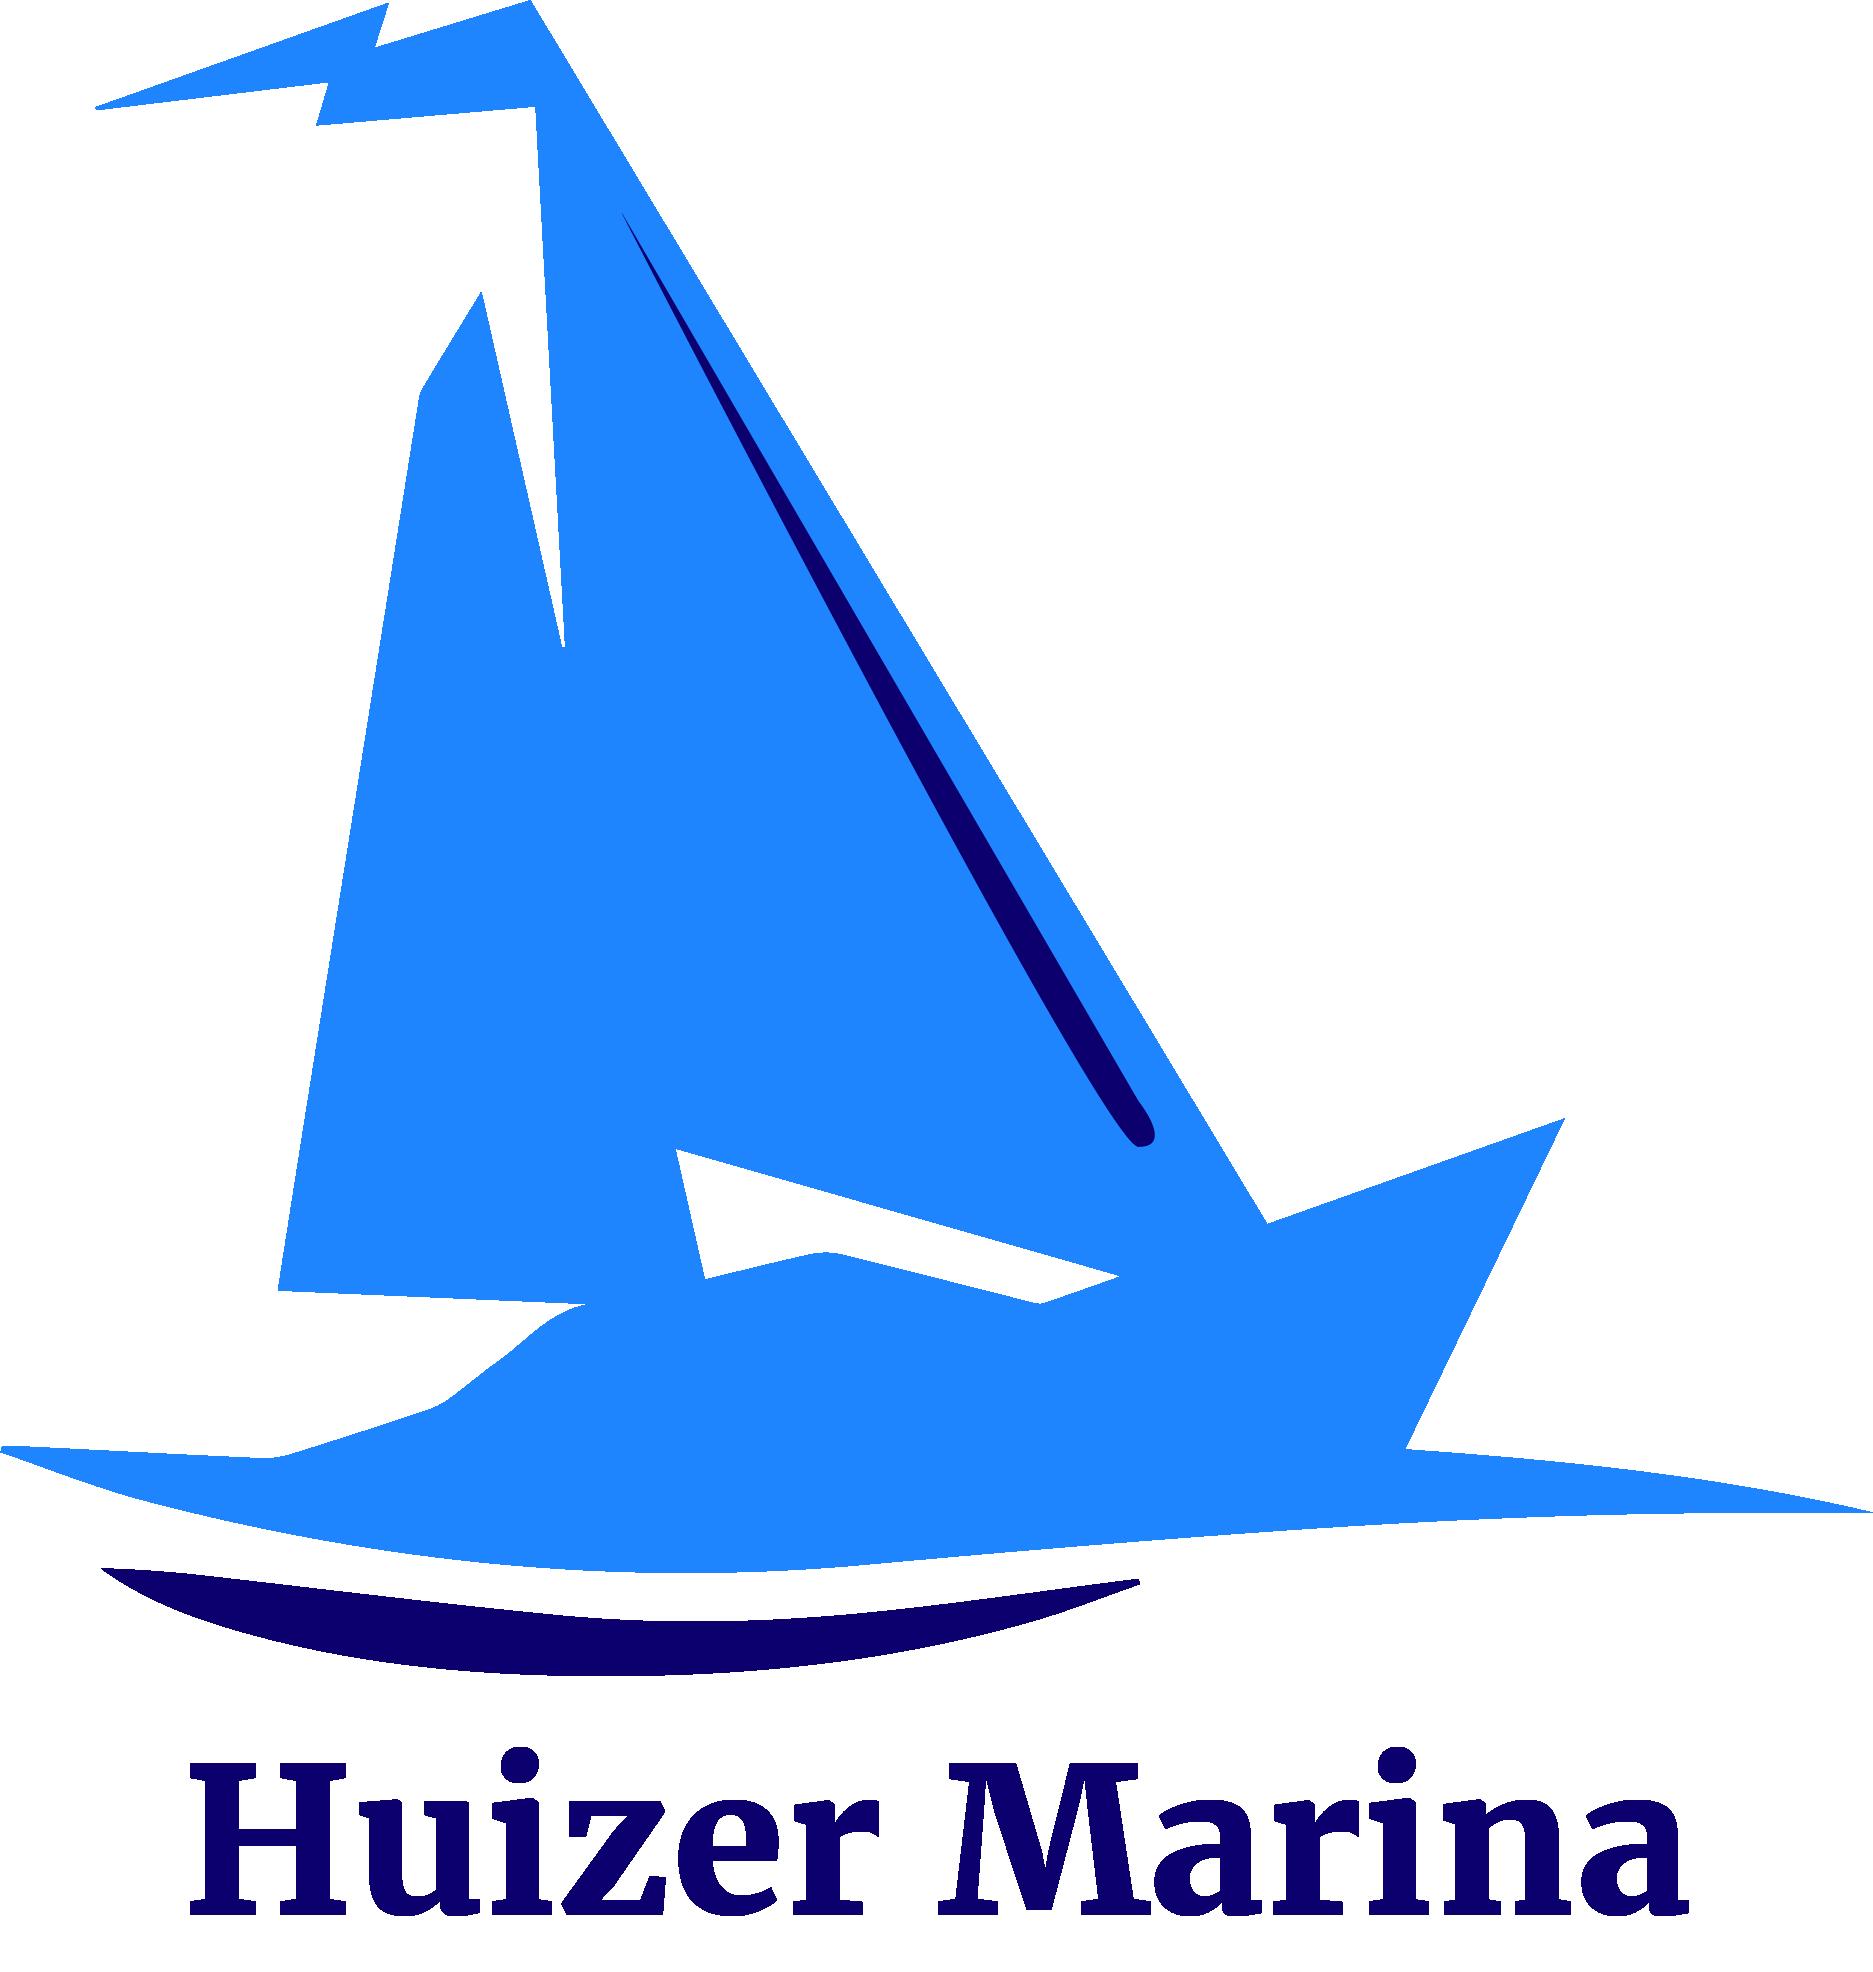 Huizer Marina